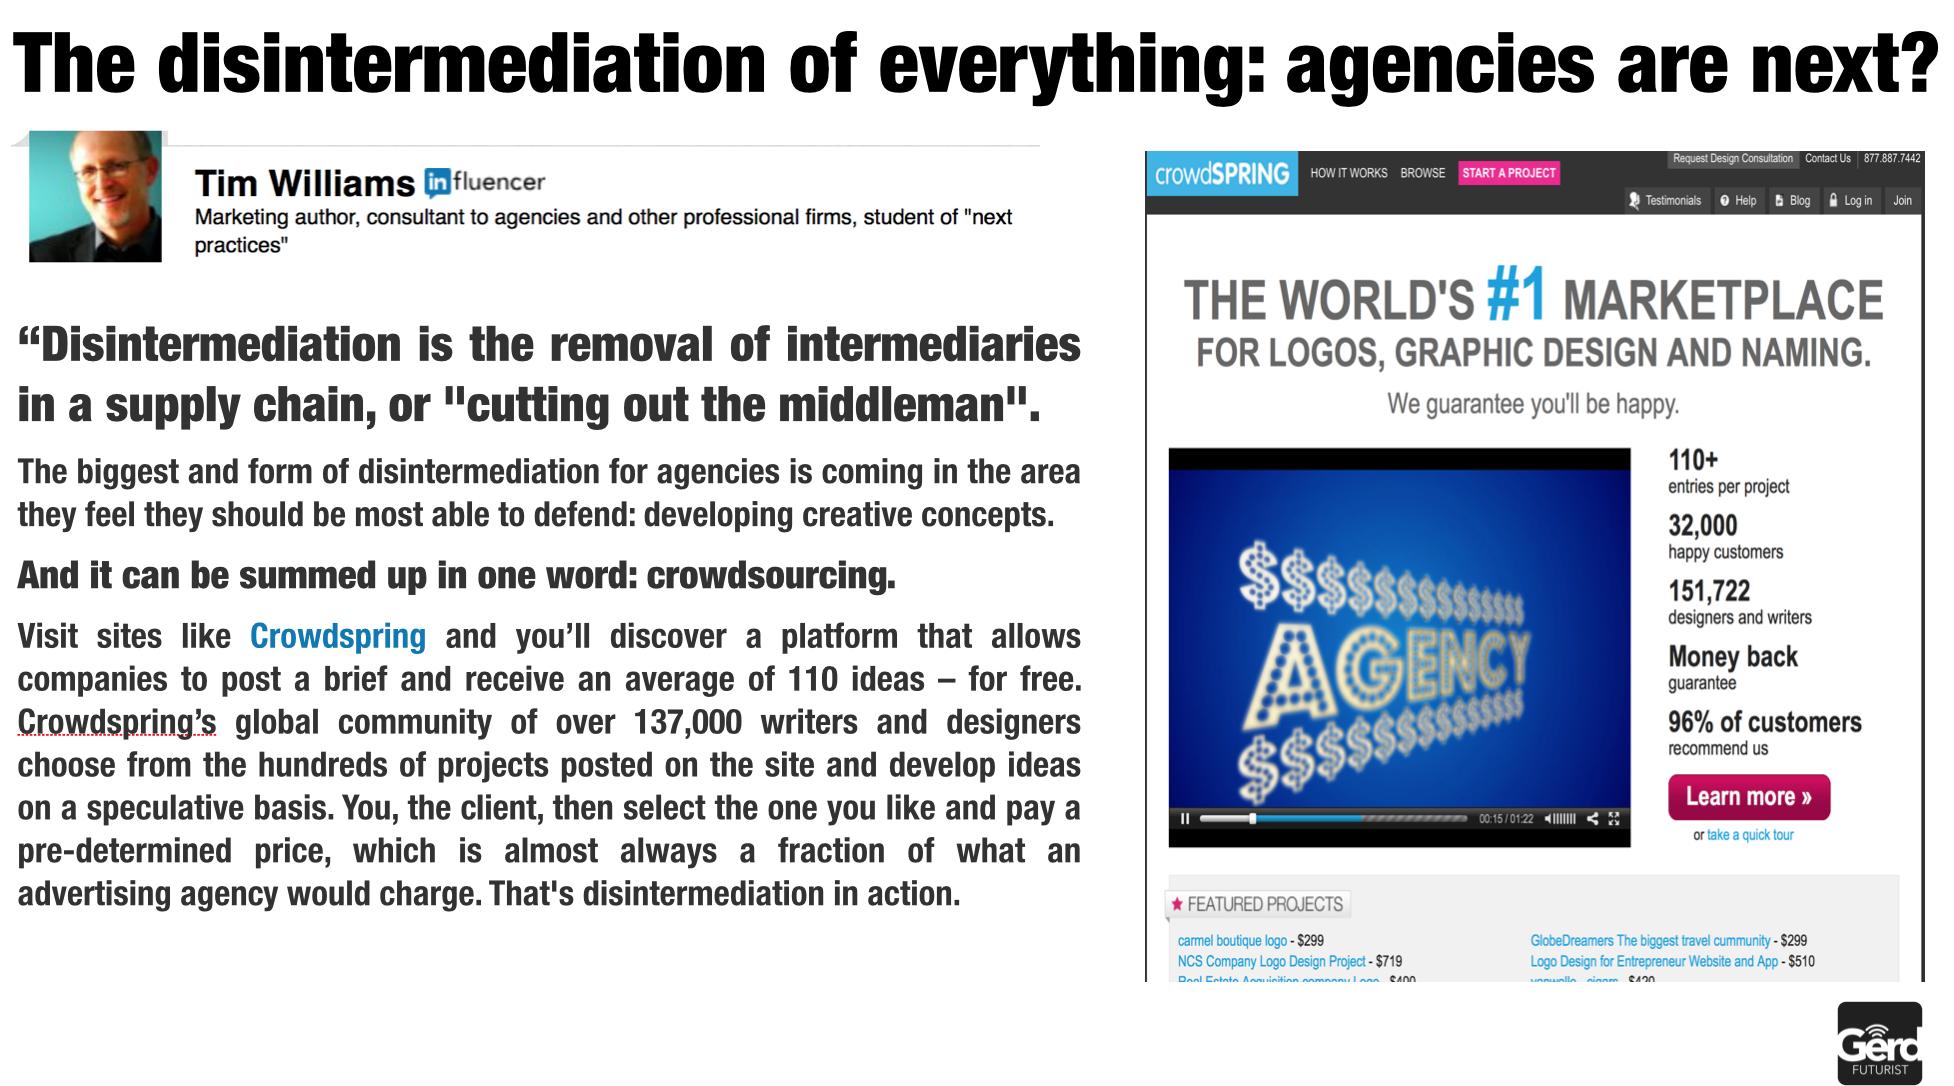 disintermediation of agencies futuristgerd